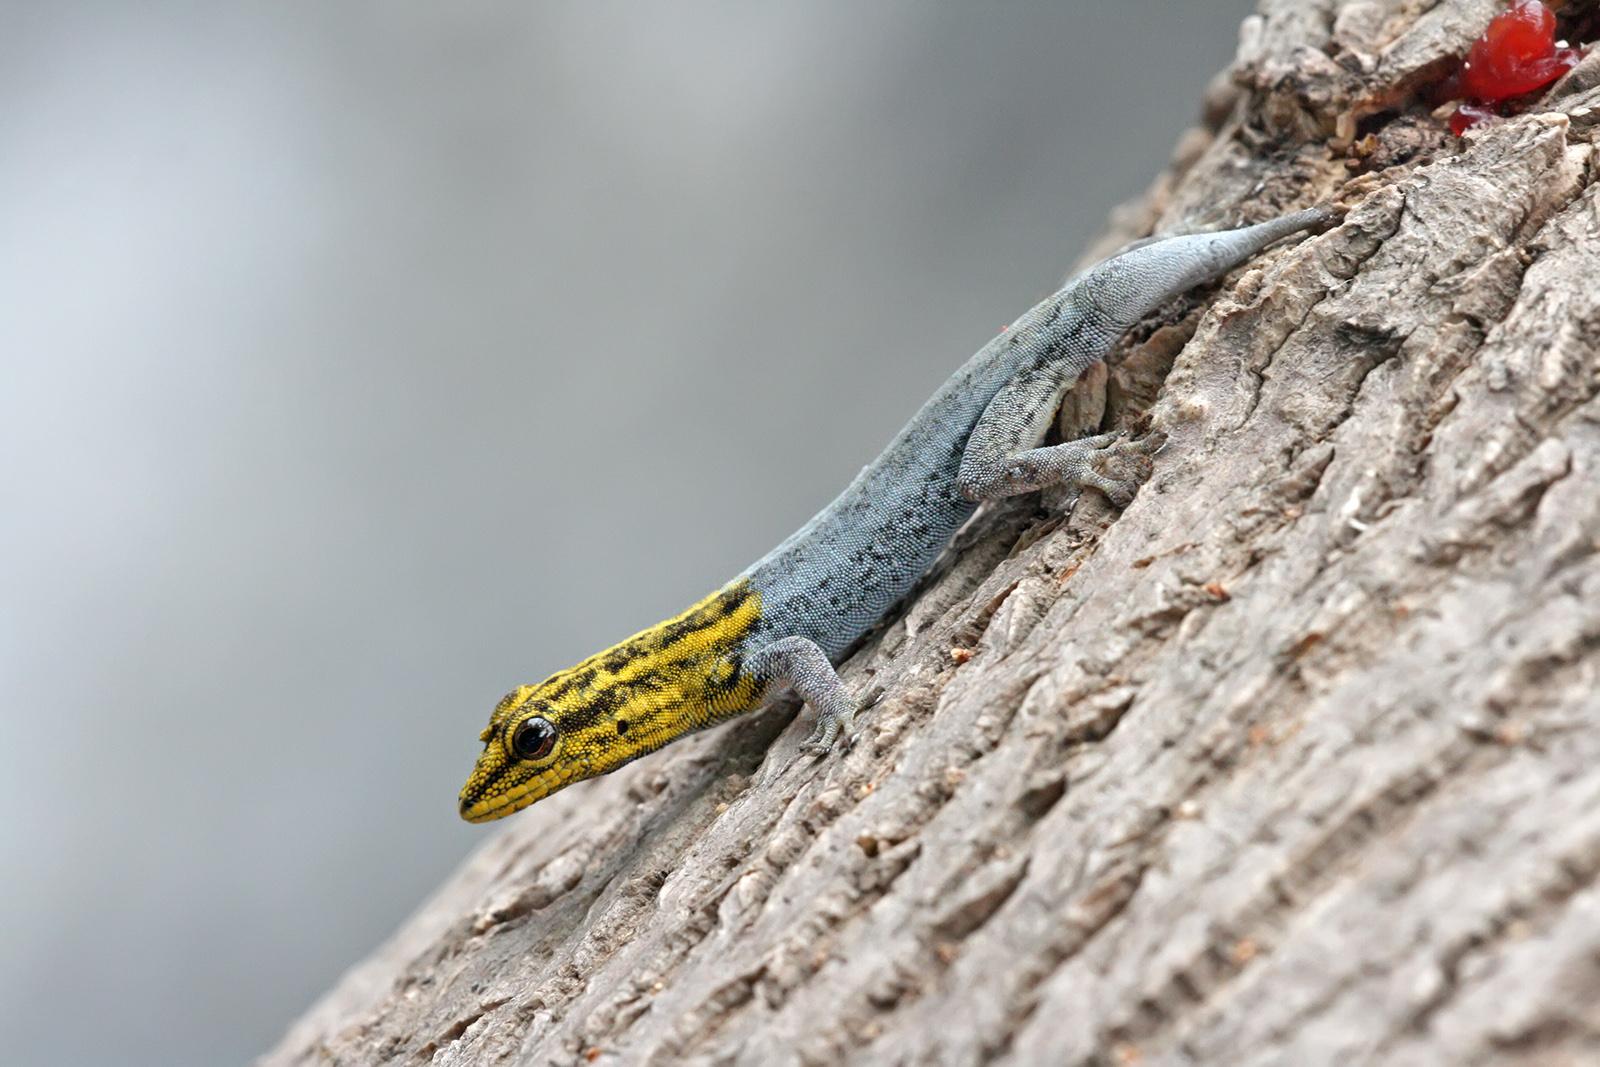 Gecko wikipedia dwarf yellow headed gecko in dar es salaam tanzania nvjuhfo Images